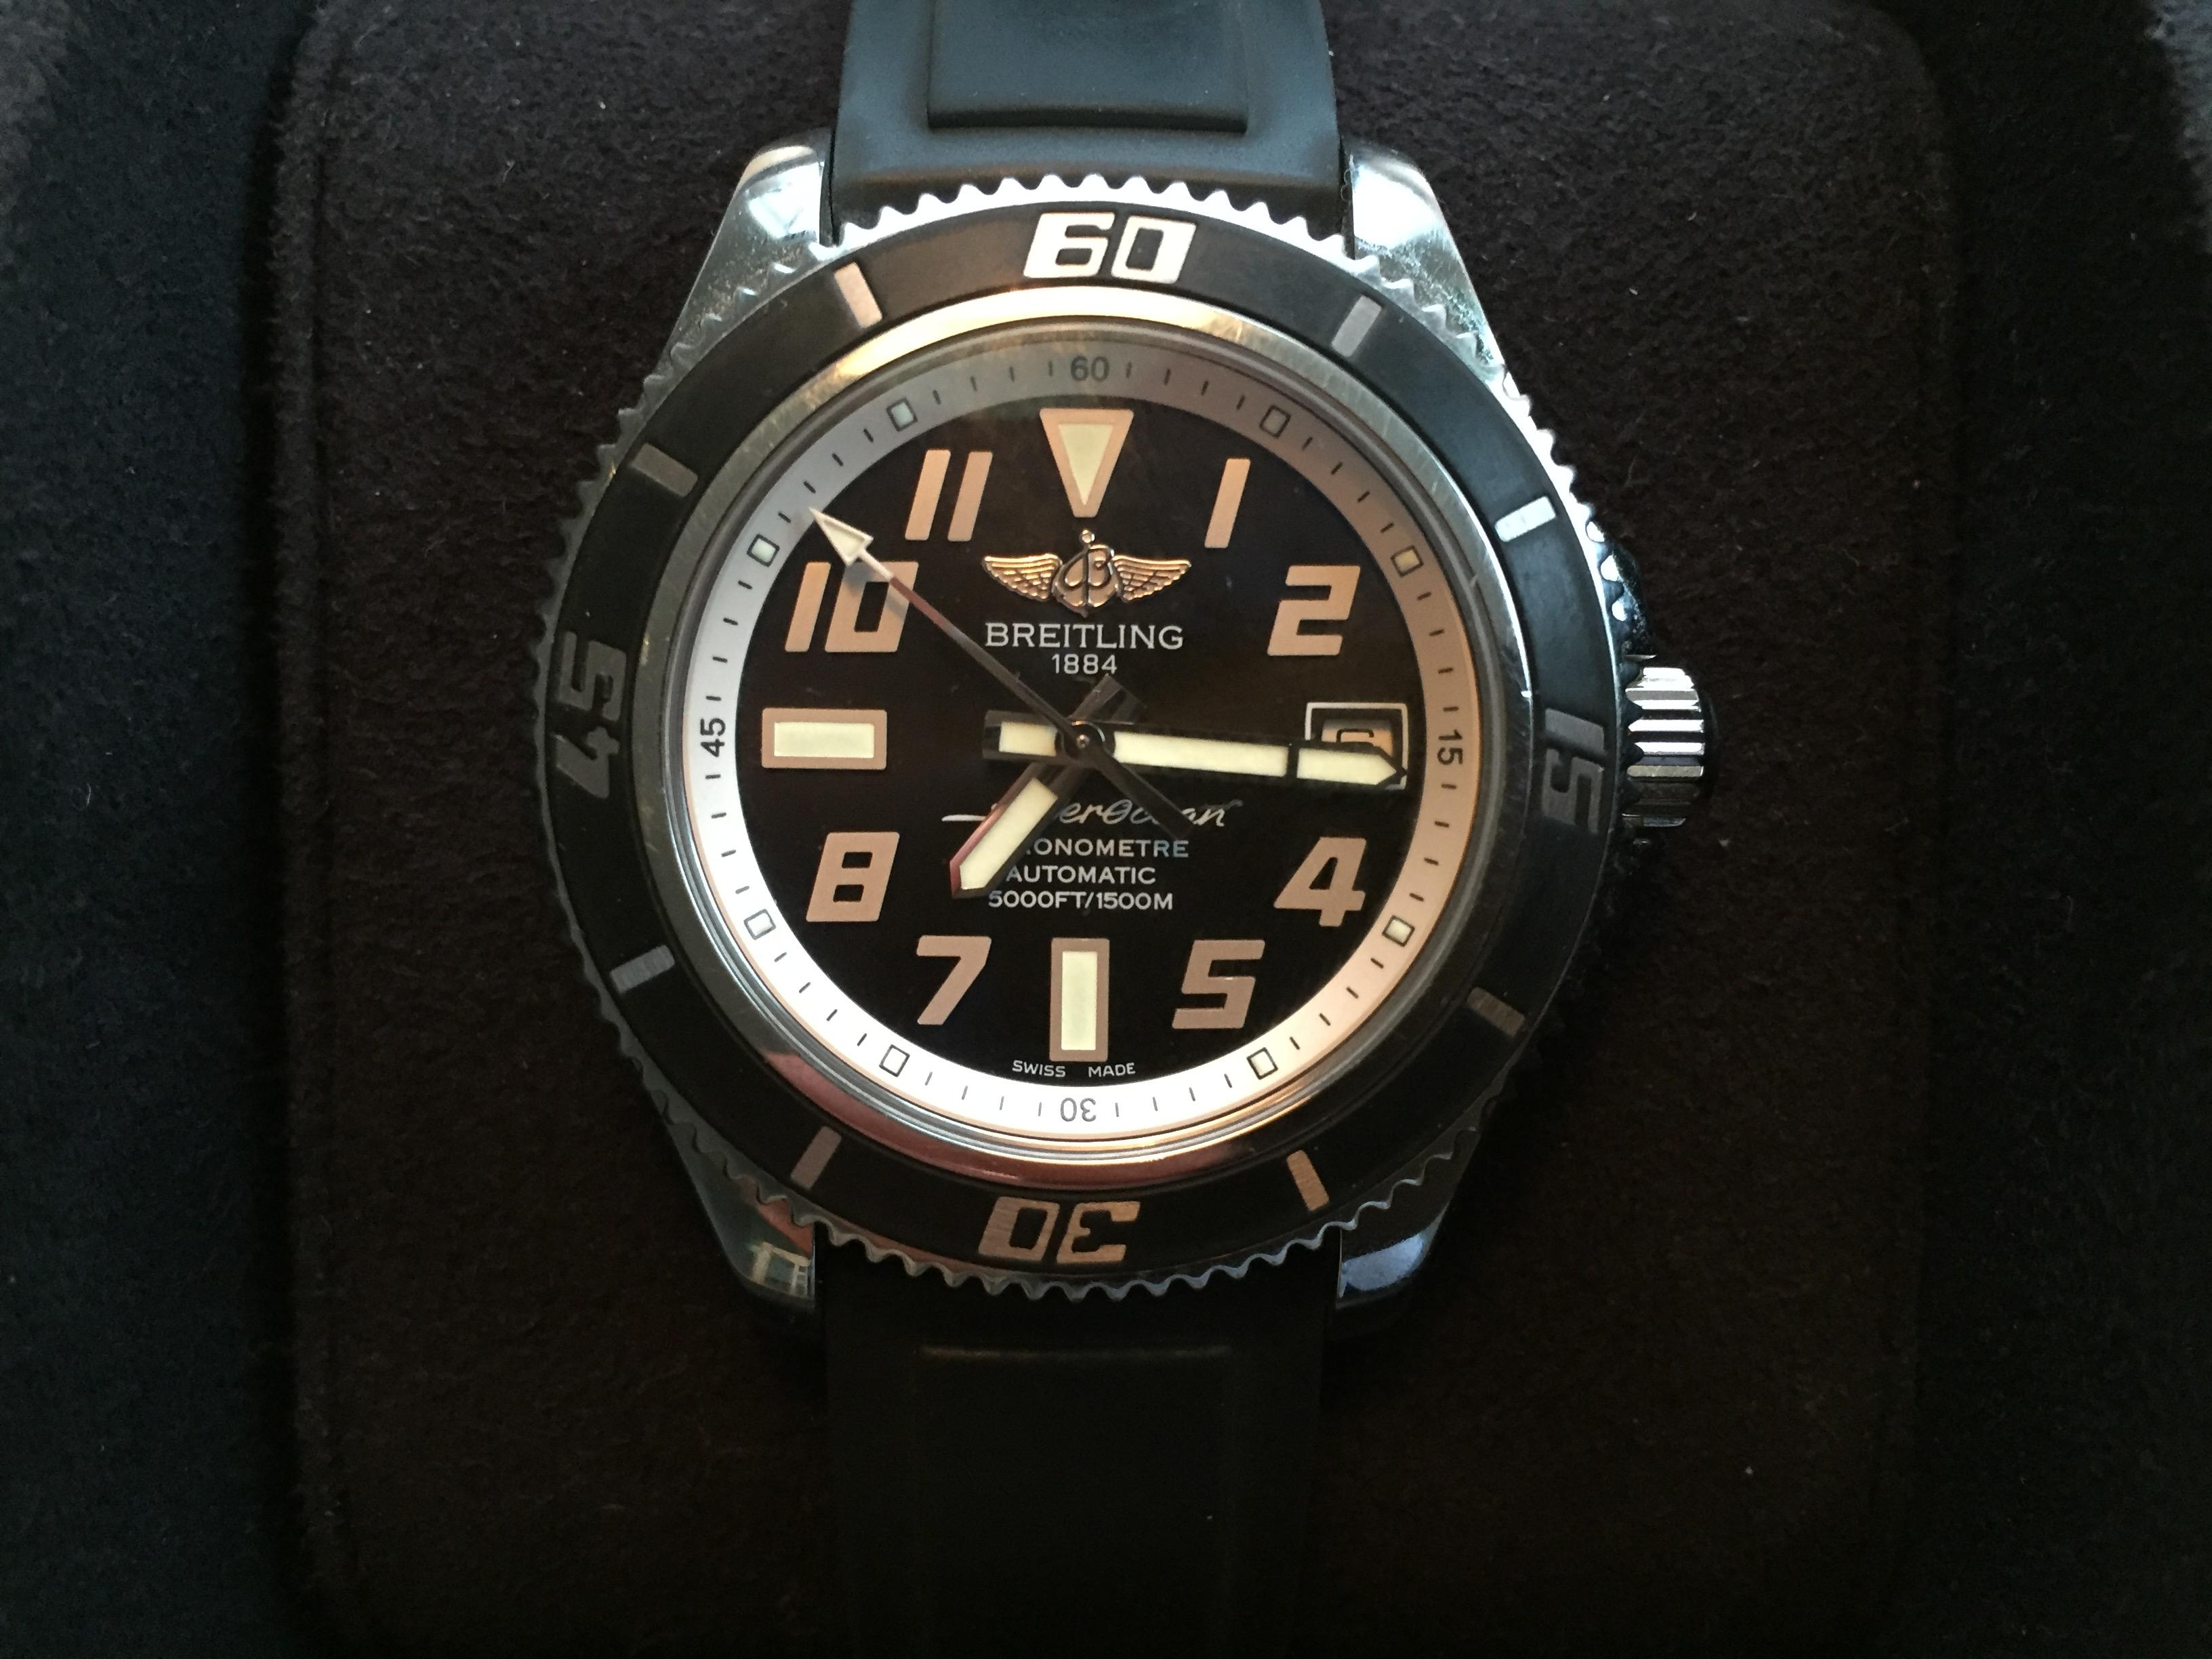 Breitling Superocean 42 norge